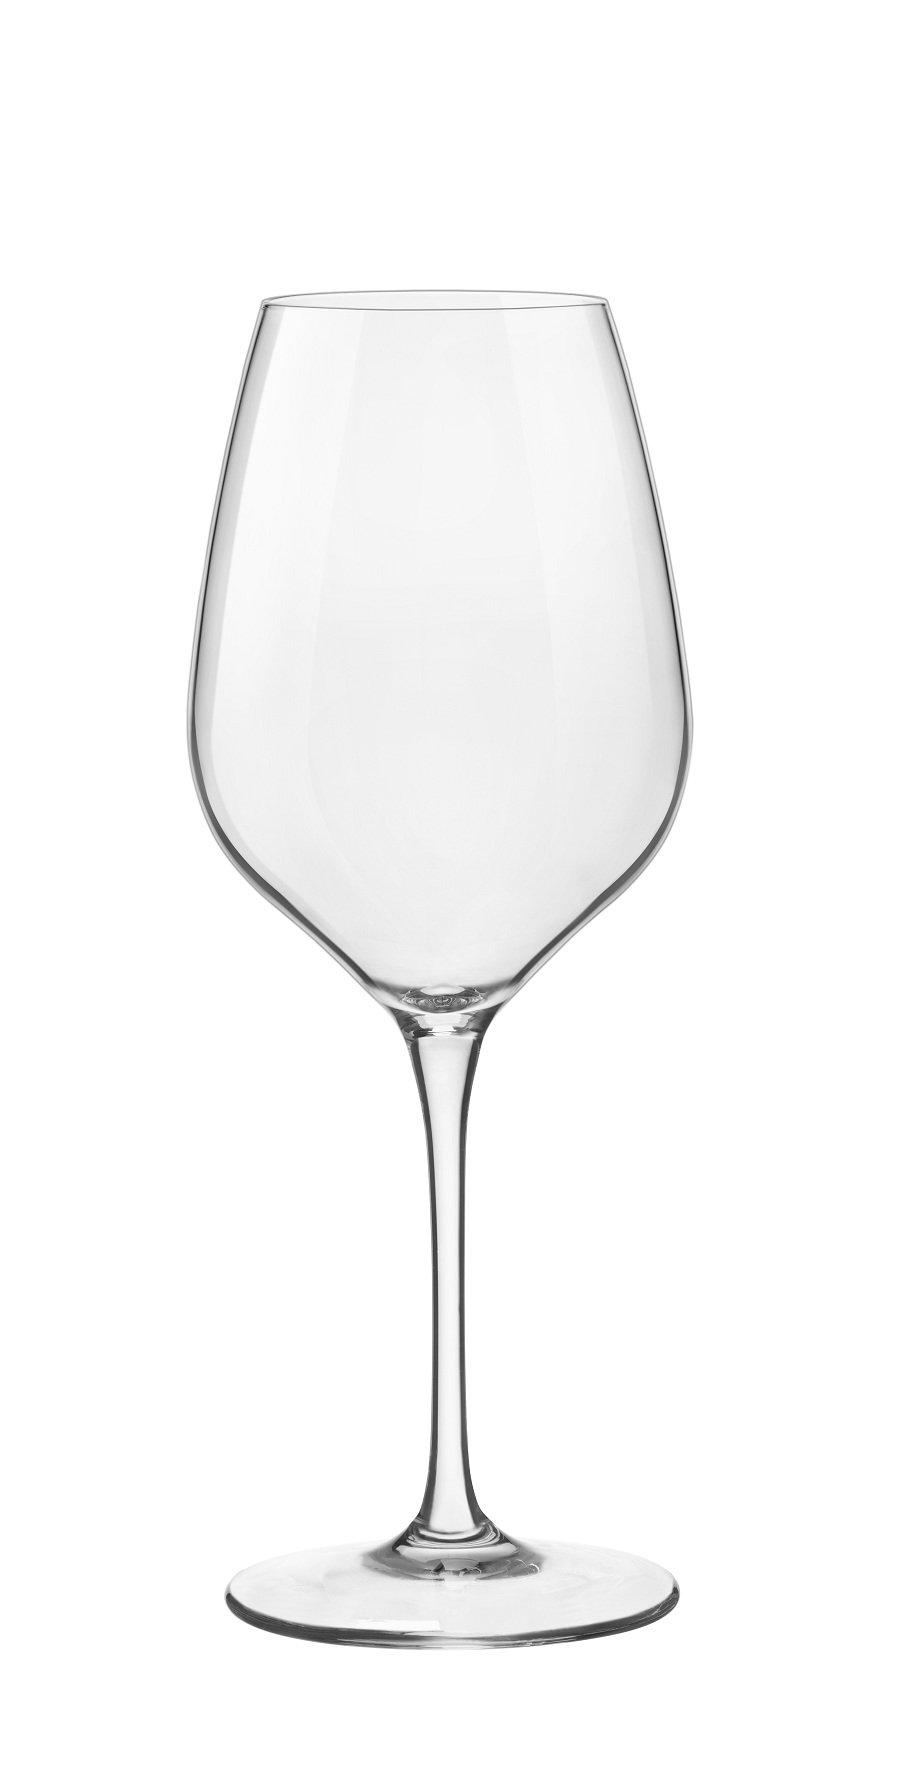 New Glassware Bormioli Rocco Tre Sensi Wine Tasting Glass